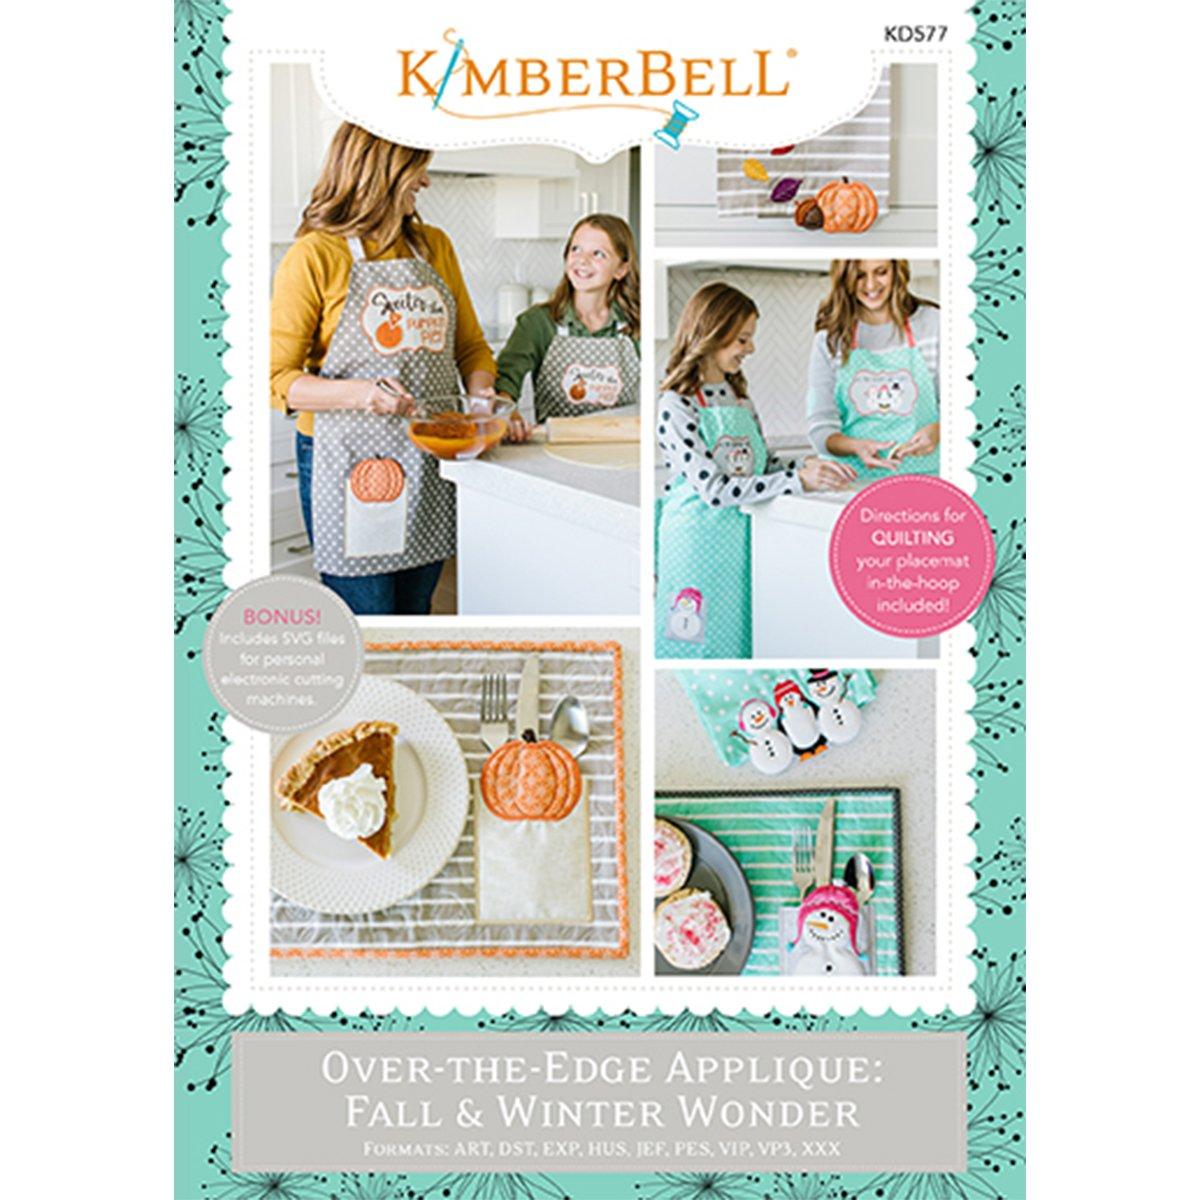 Kimberbell - Over-the-Edge Applique: Fall-Winter Wonder ME